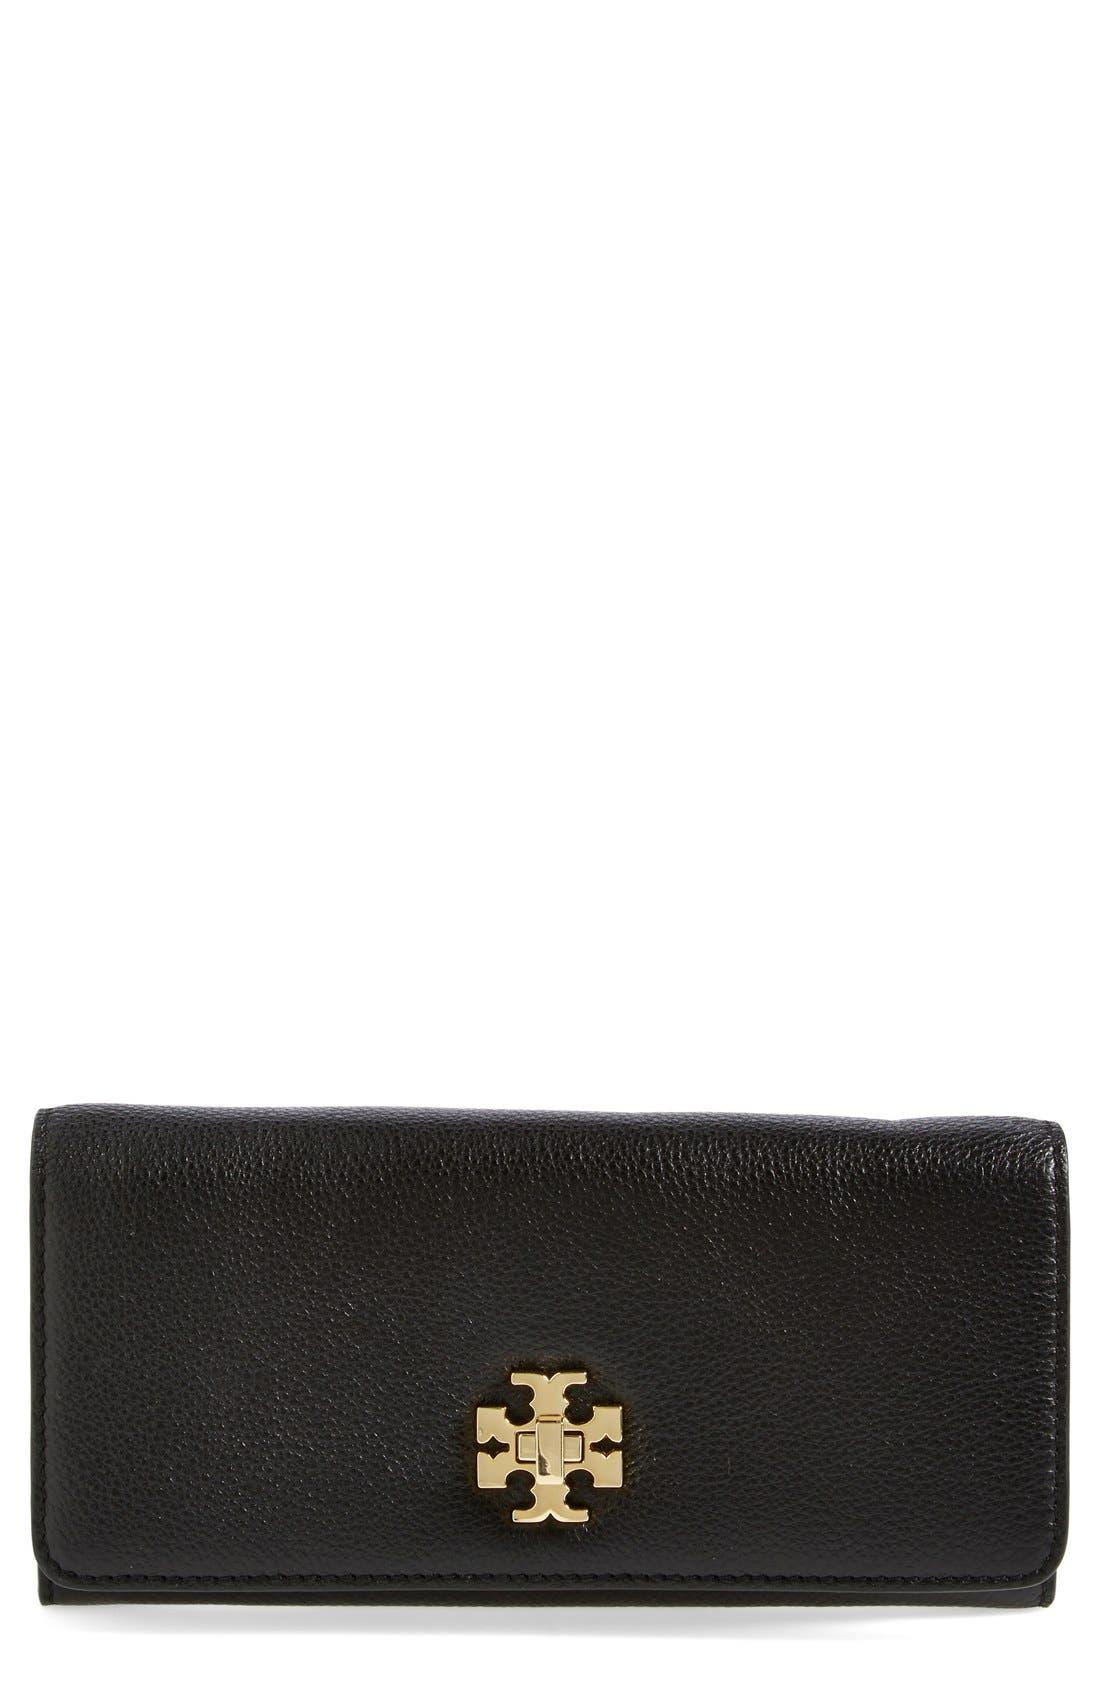 Alternate Image 1 Selected - Tory Burch 'Mercer' Leather Envelope Wallet